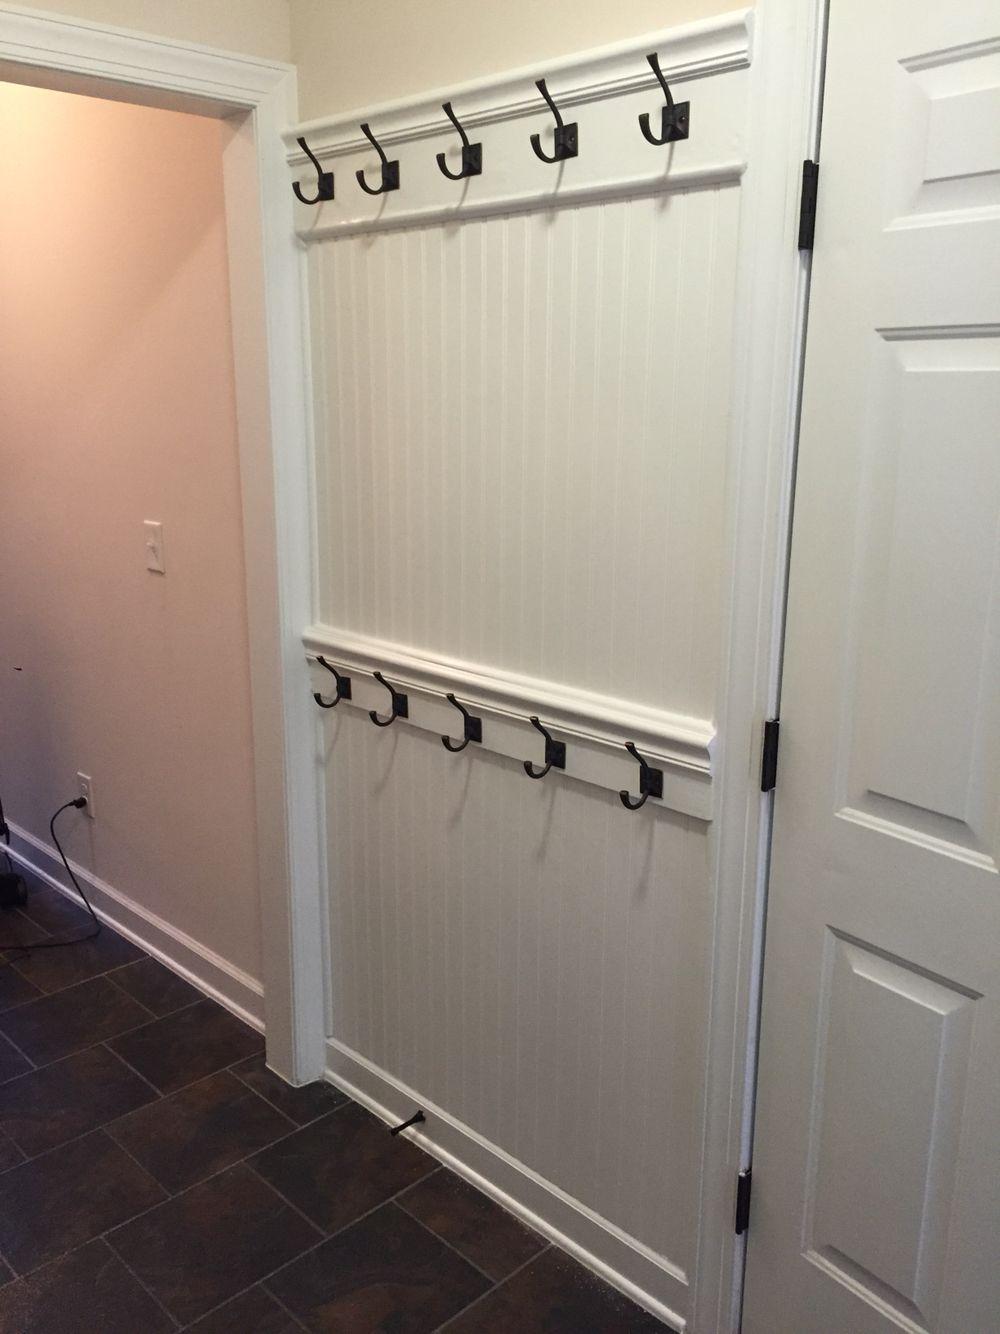 Diy Coat Rack Wall Rustic Entryway